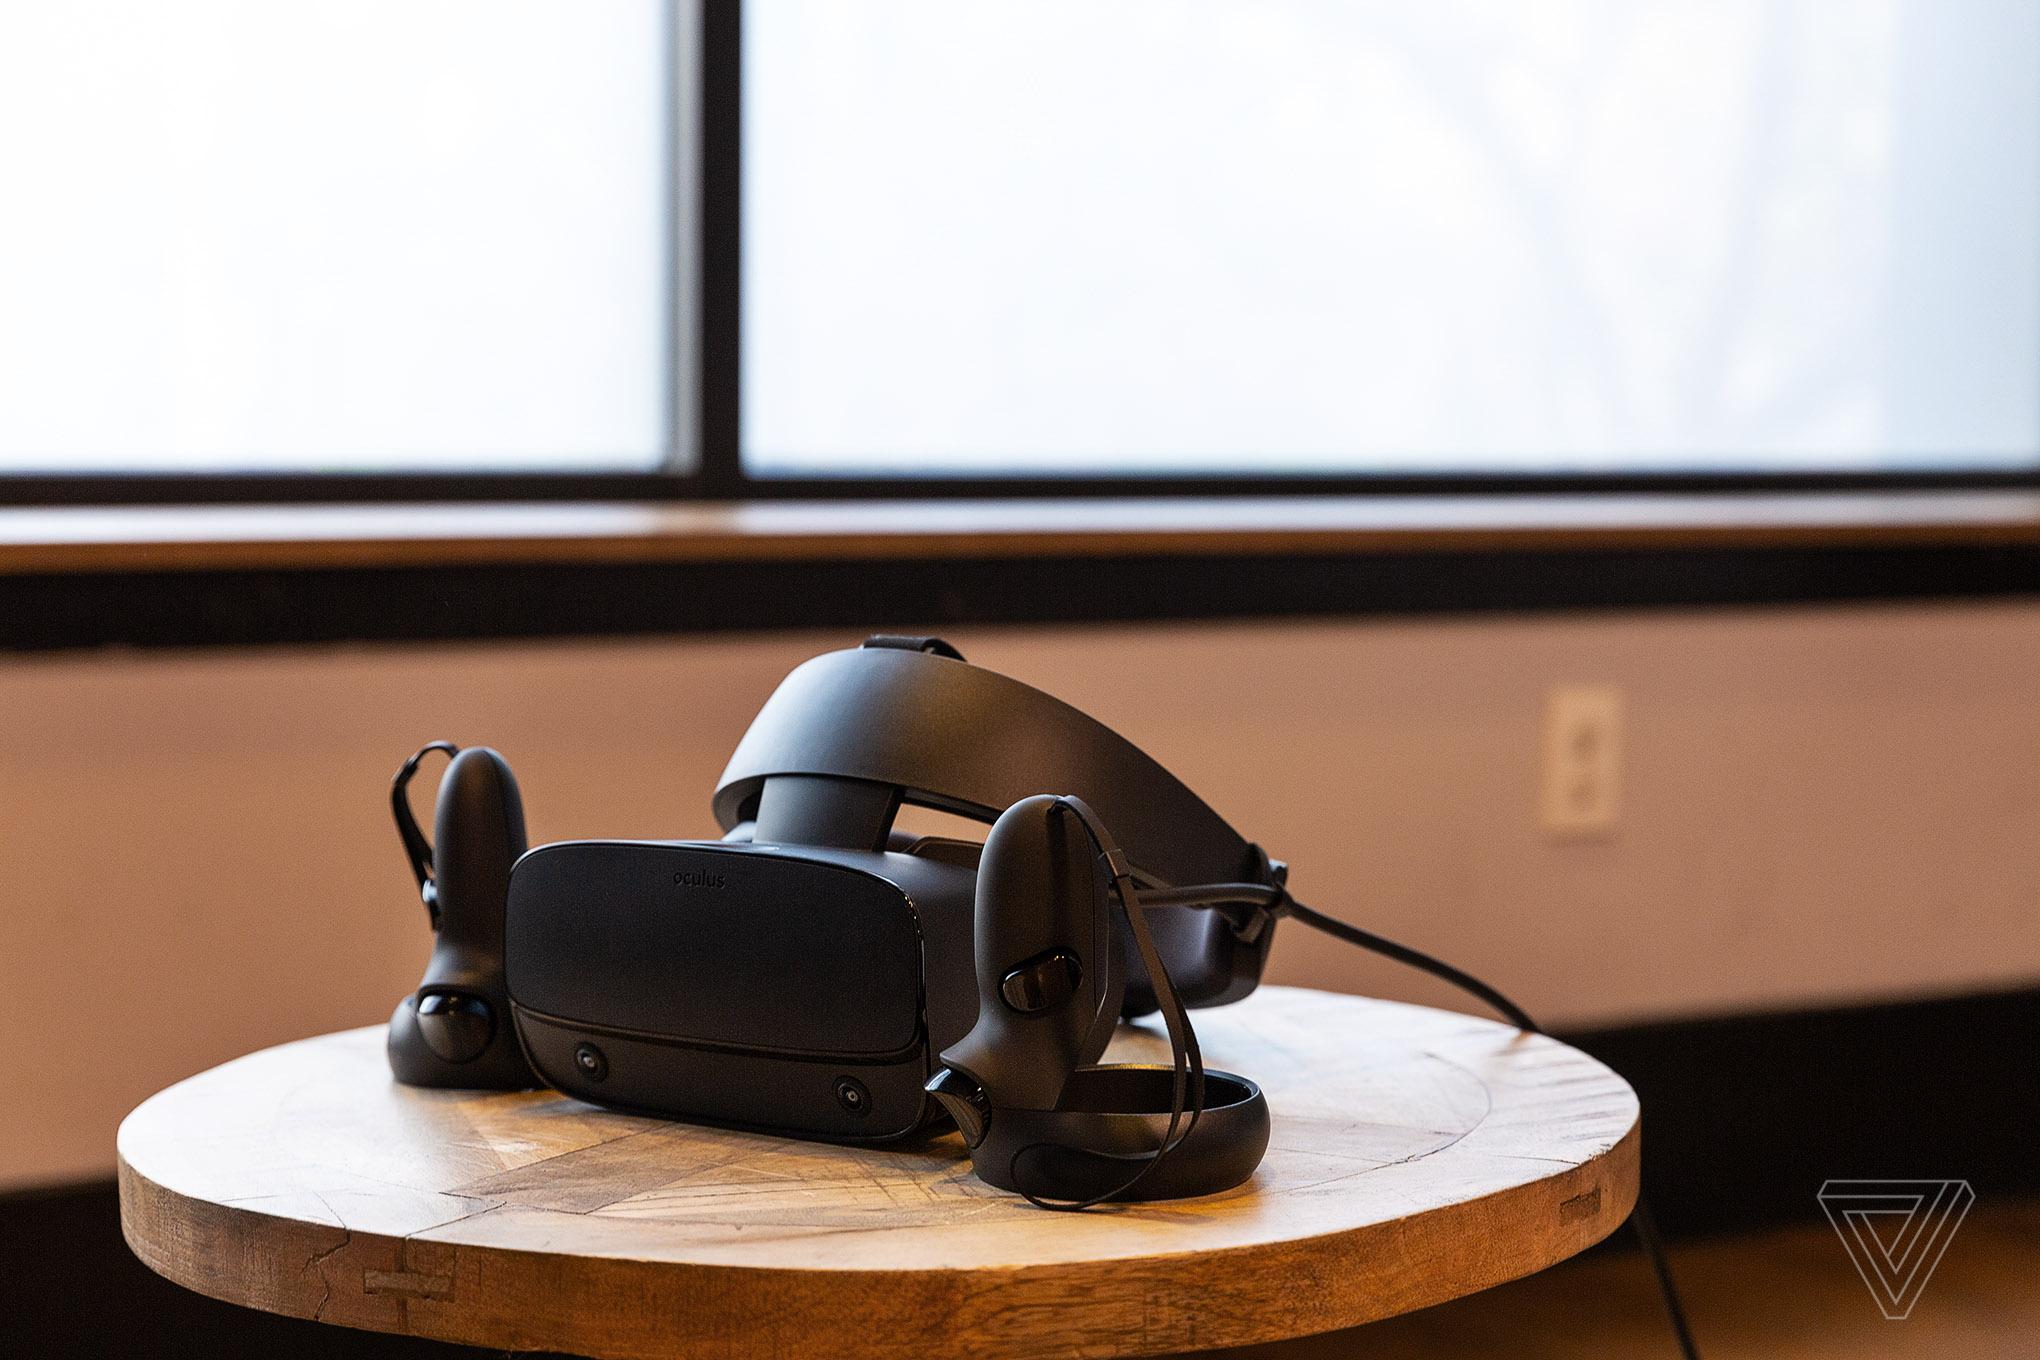 Oculus unveils the Rift S, a higher-resolution VR headset